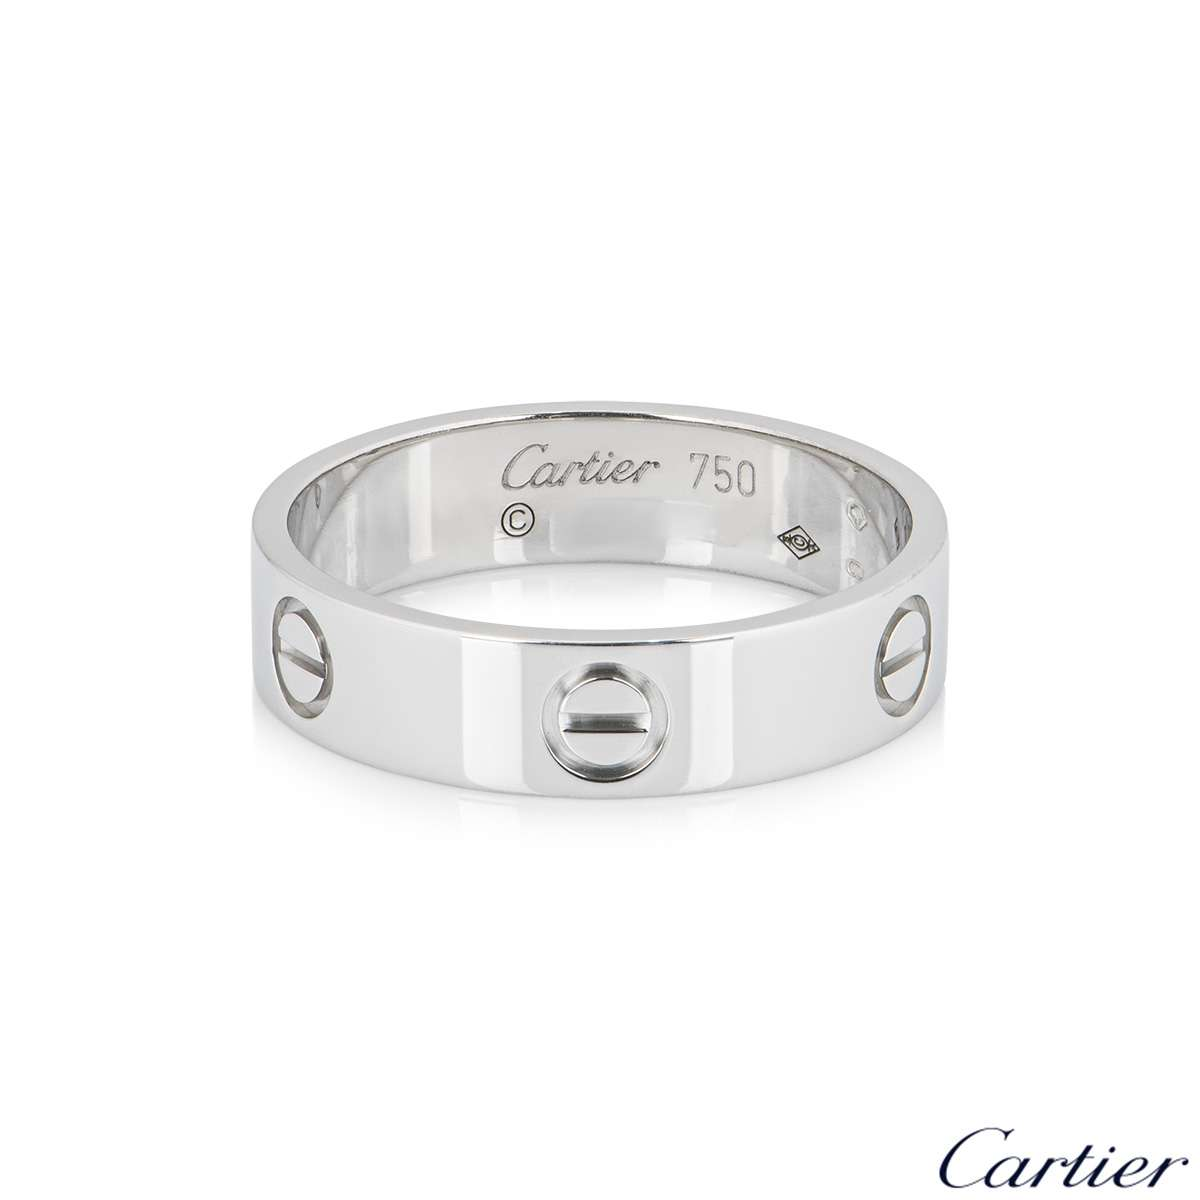 Cartier White Gold Plain Love Ring Size 54 B4084700